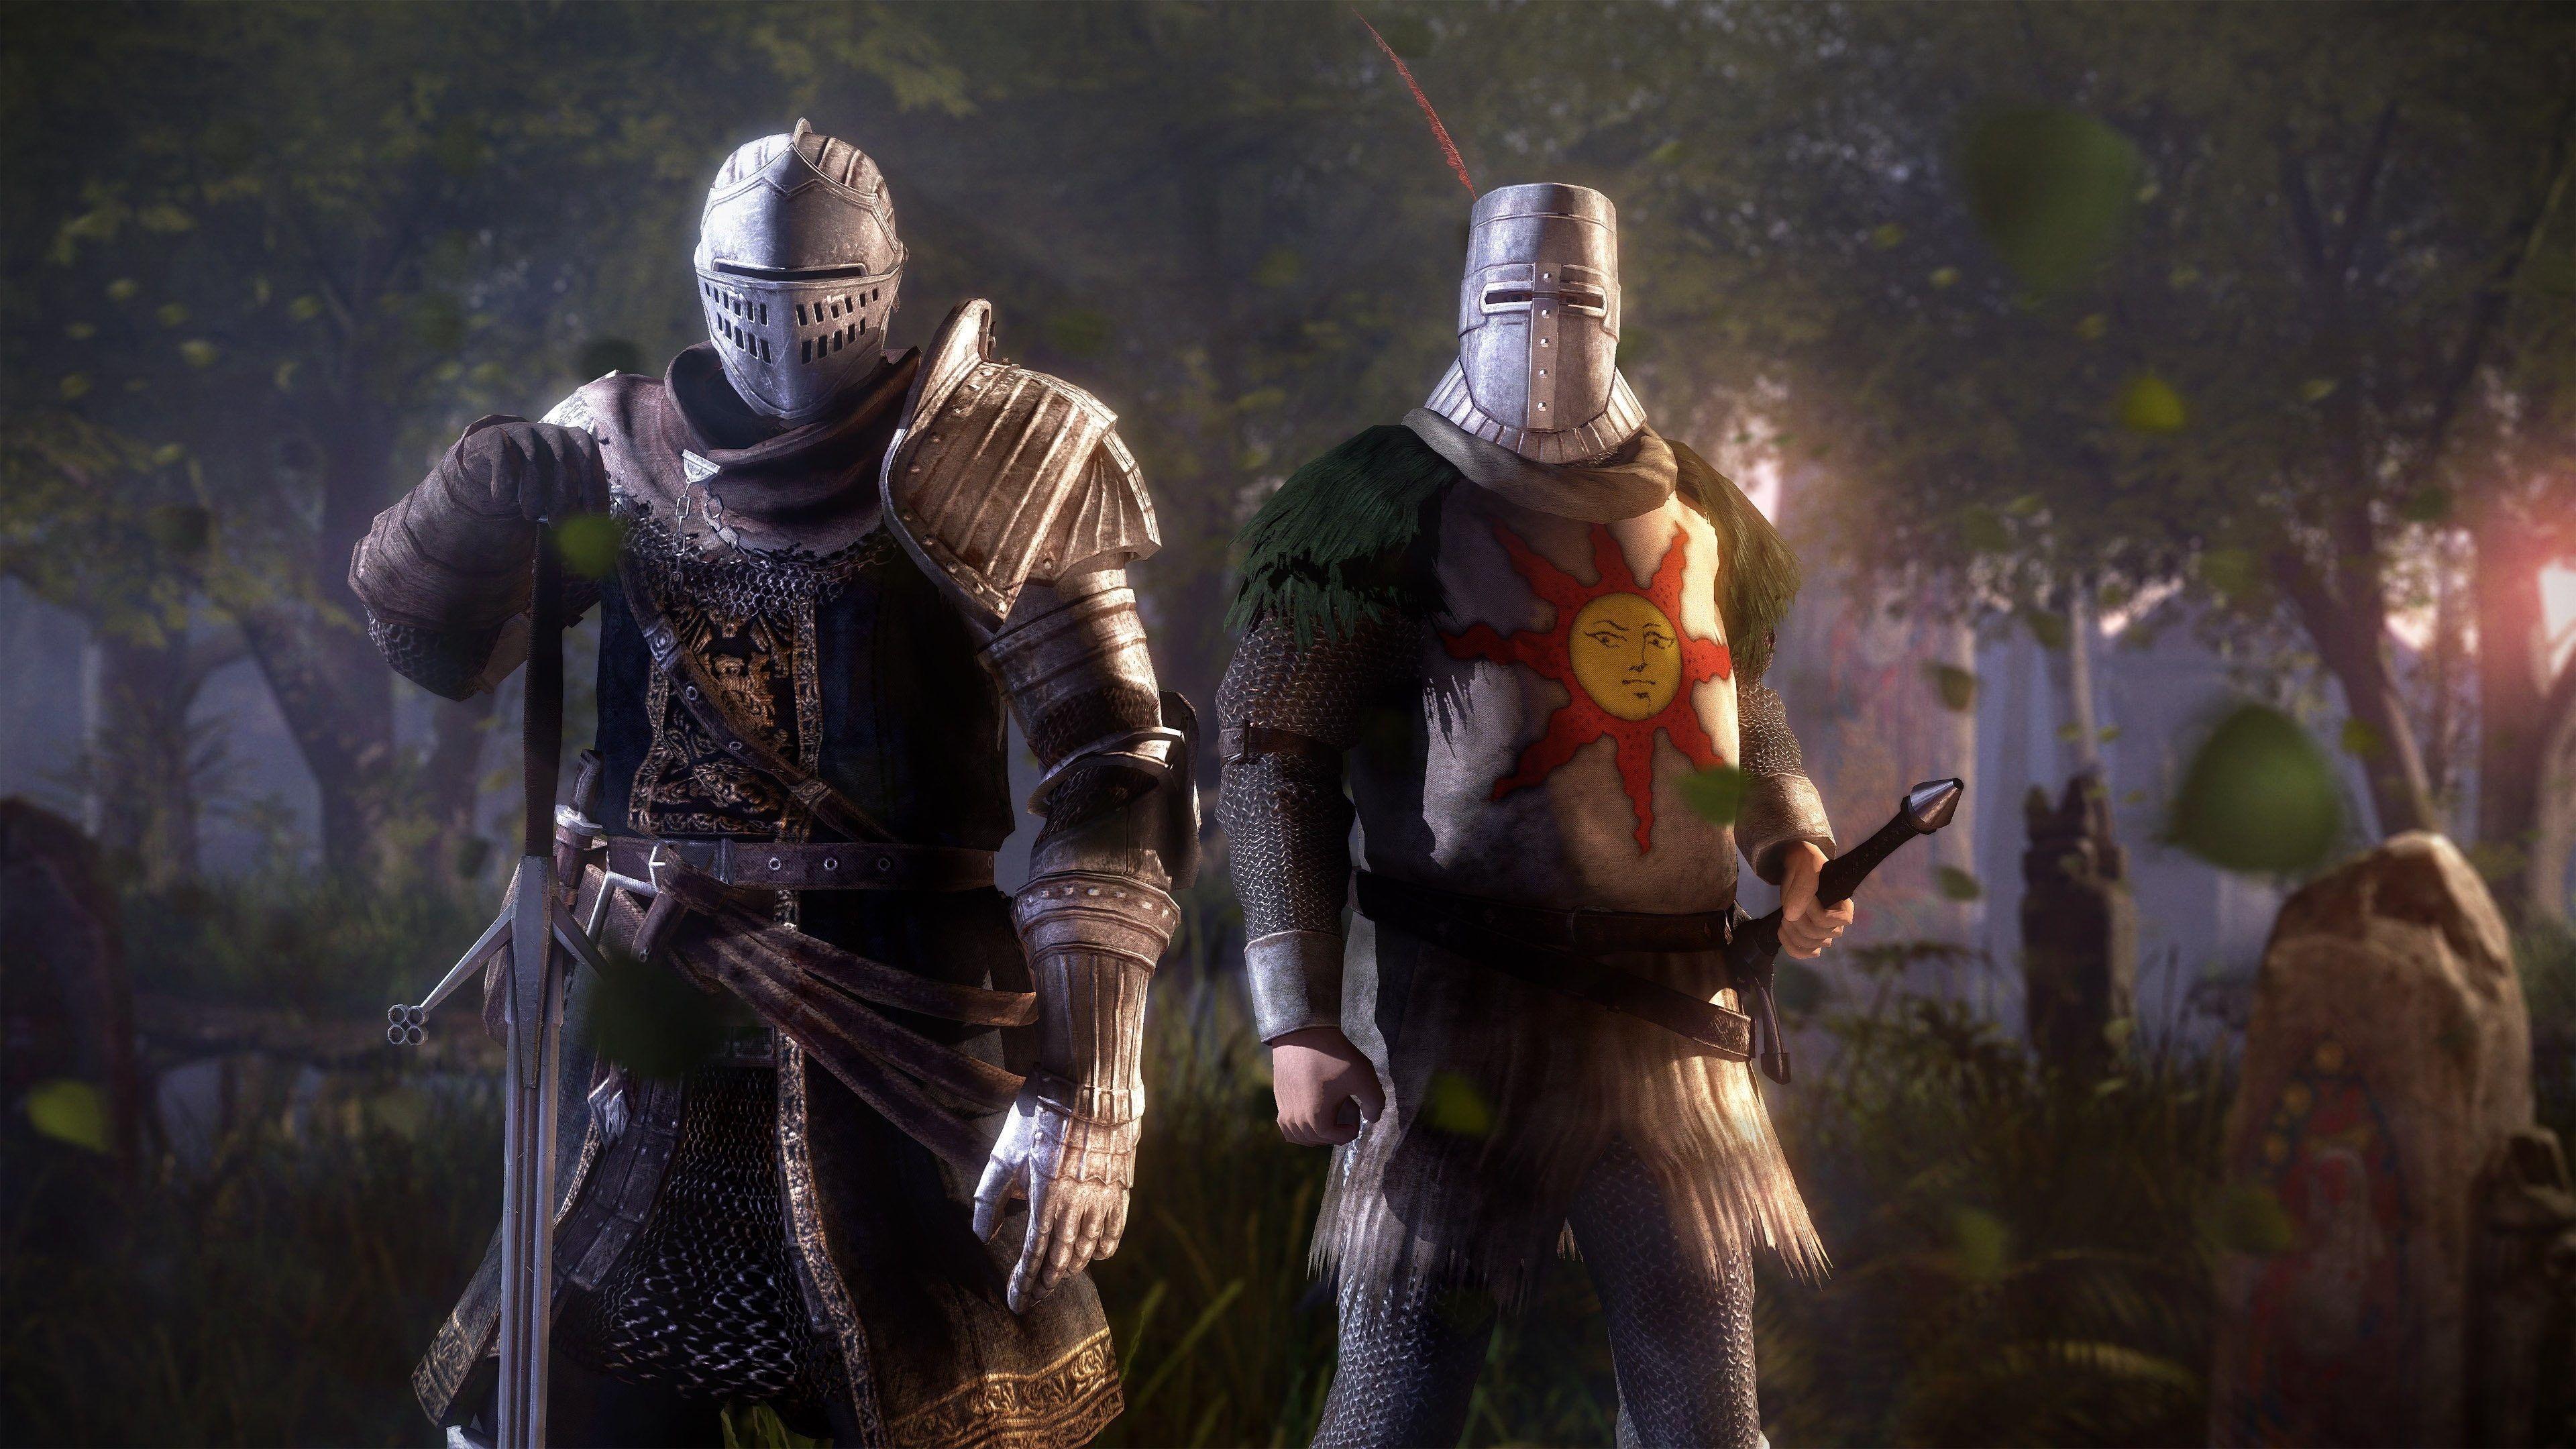 Dark Souls 3 4k Backgrounds For Desktop Hd Backgrounds 4k Wallpaper Hdwallpaper Desktop In 2020 Dark Souls Dark Souls 3 Dark Souls Solaire